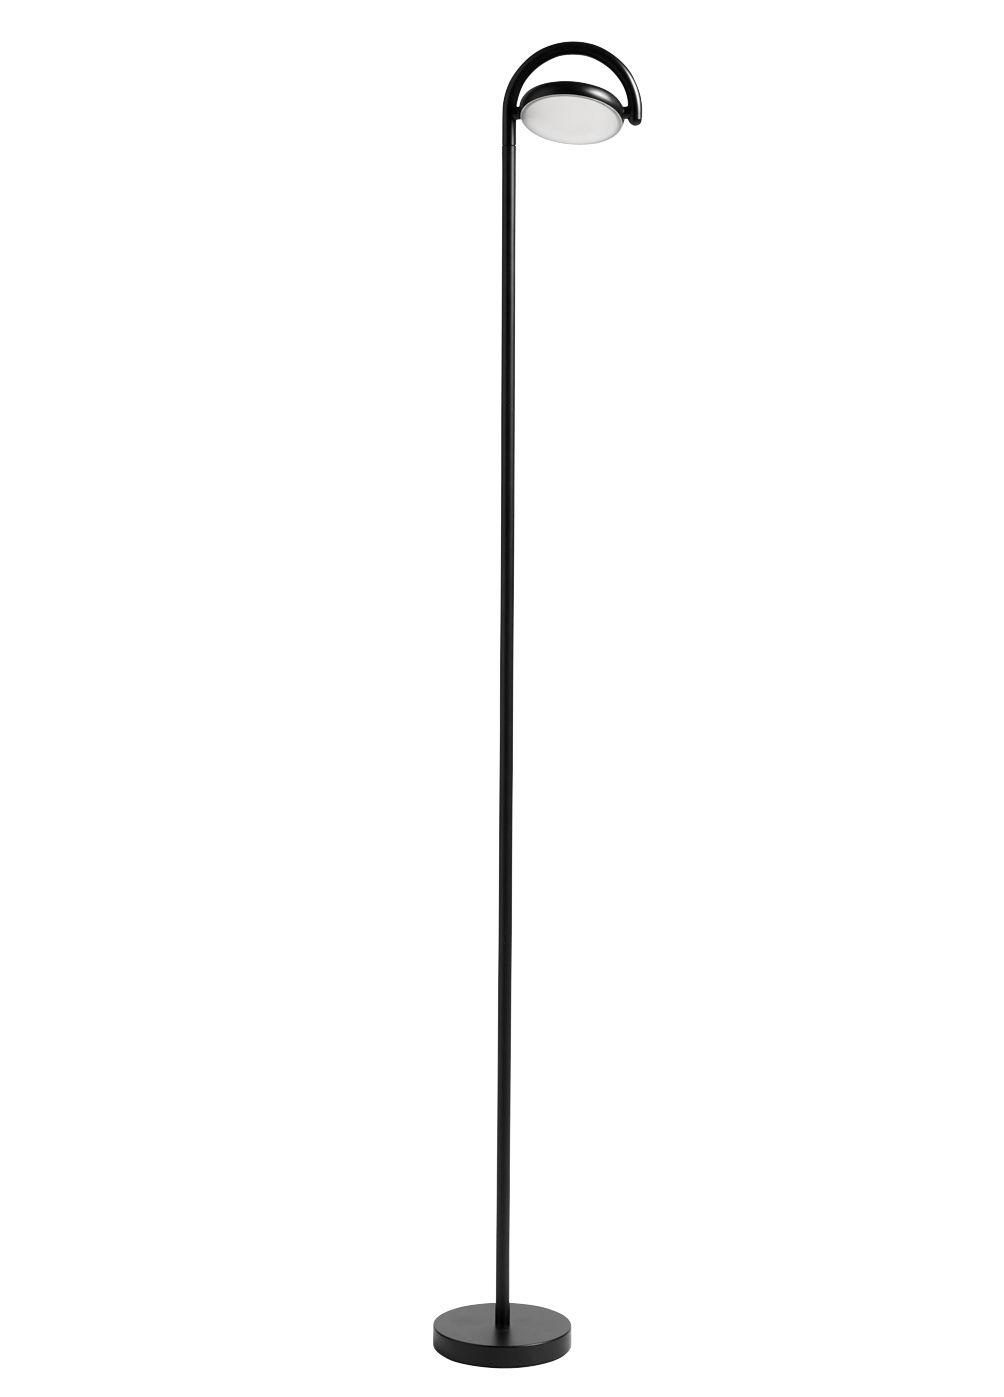 Luminaire - Lampadaires - Lampadaire Marselis / Diffuseur orientable - H 126 cm - Hay - Noir - Acier, Aluminium, Fonte de sable, Nylon, Polycarbonate